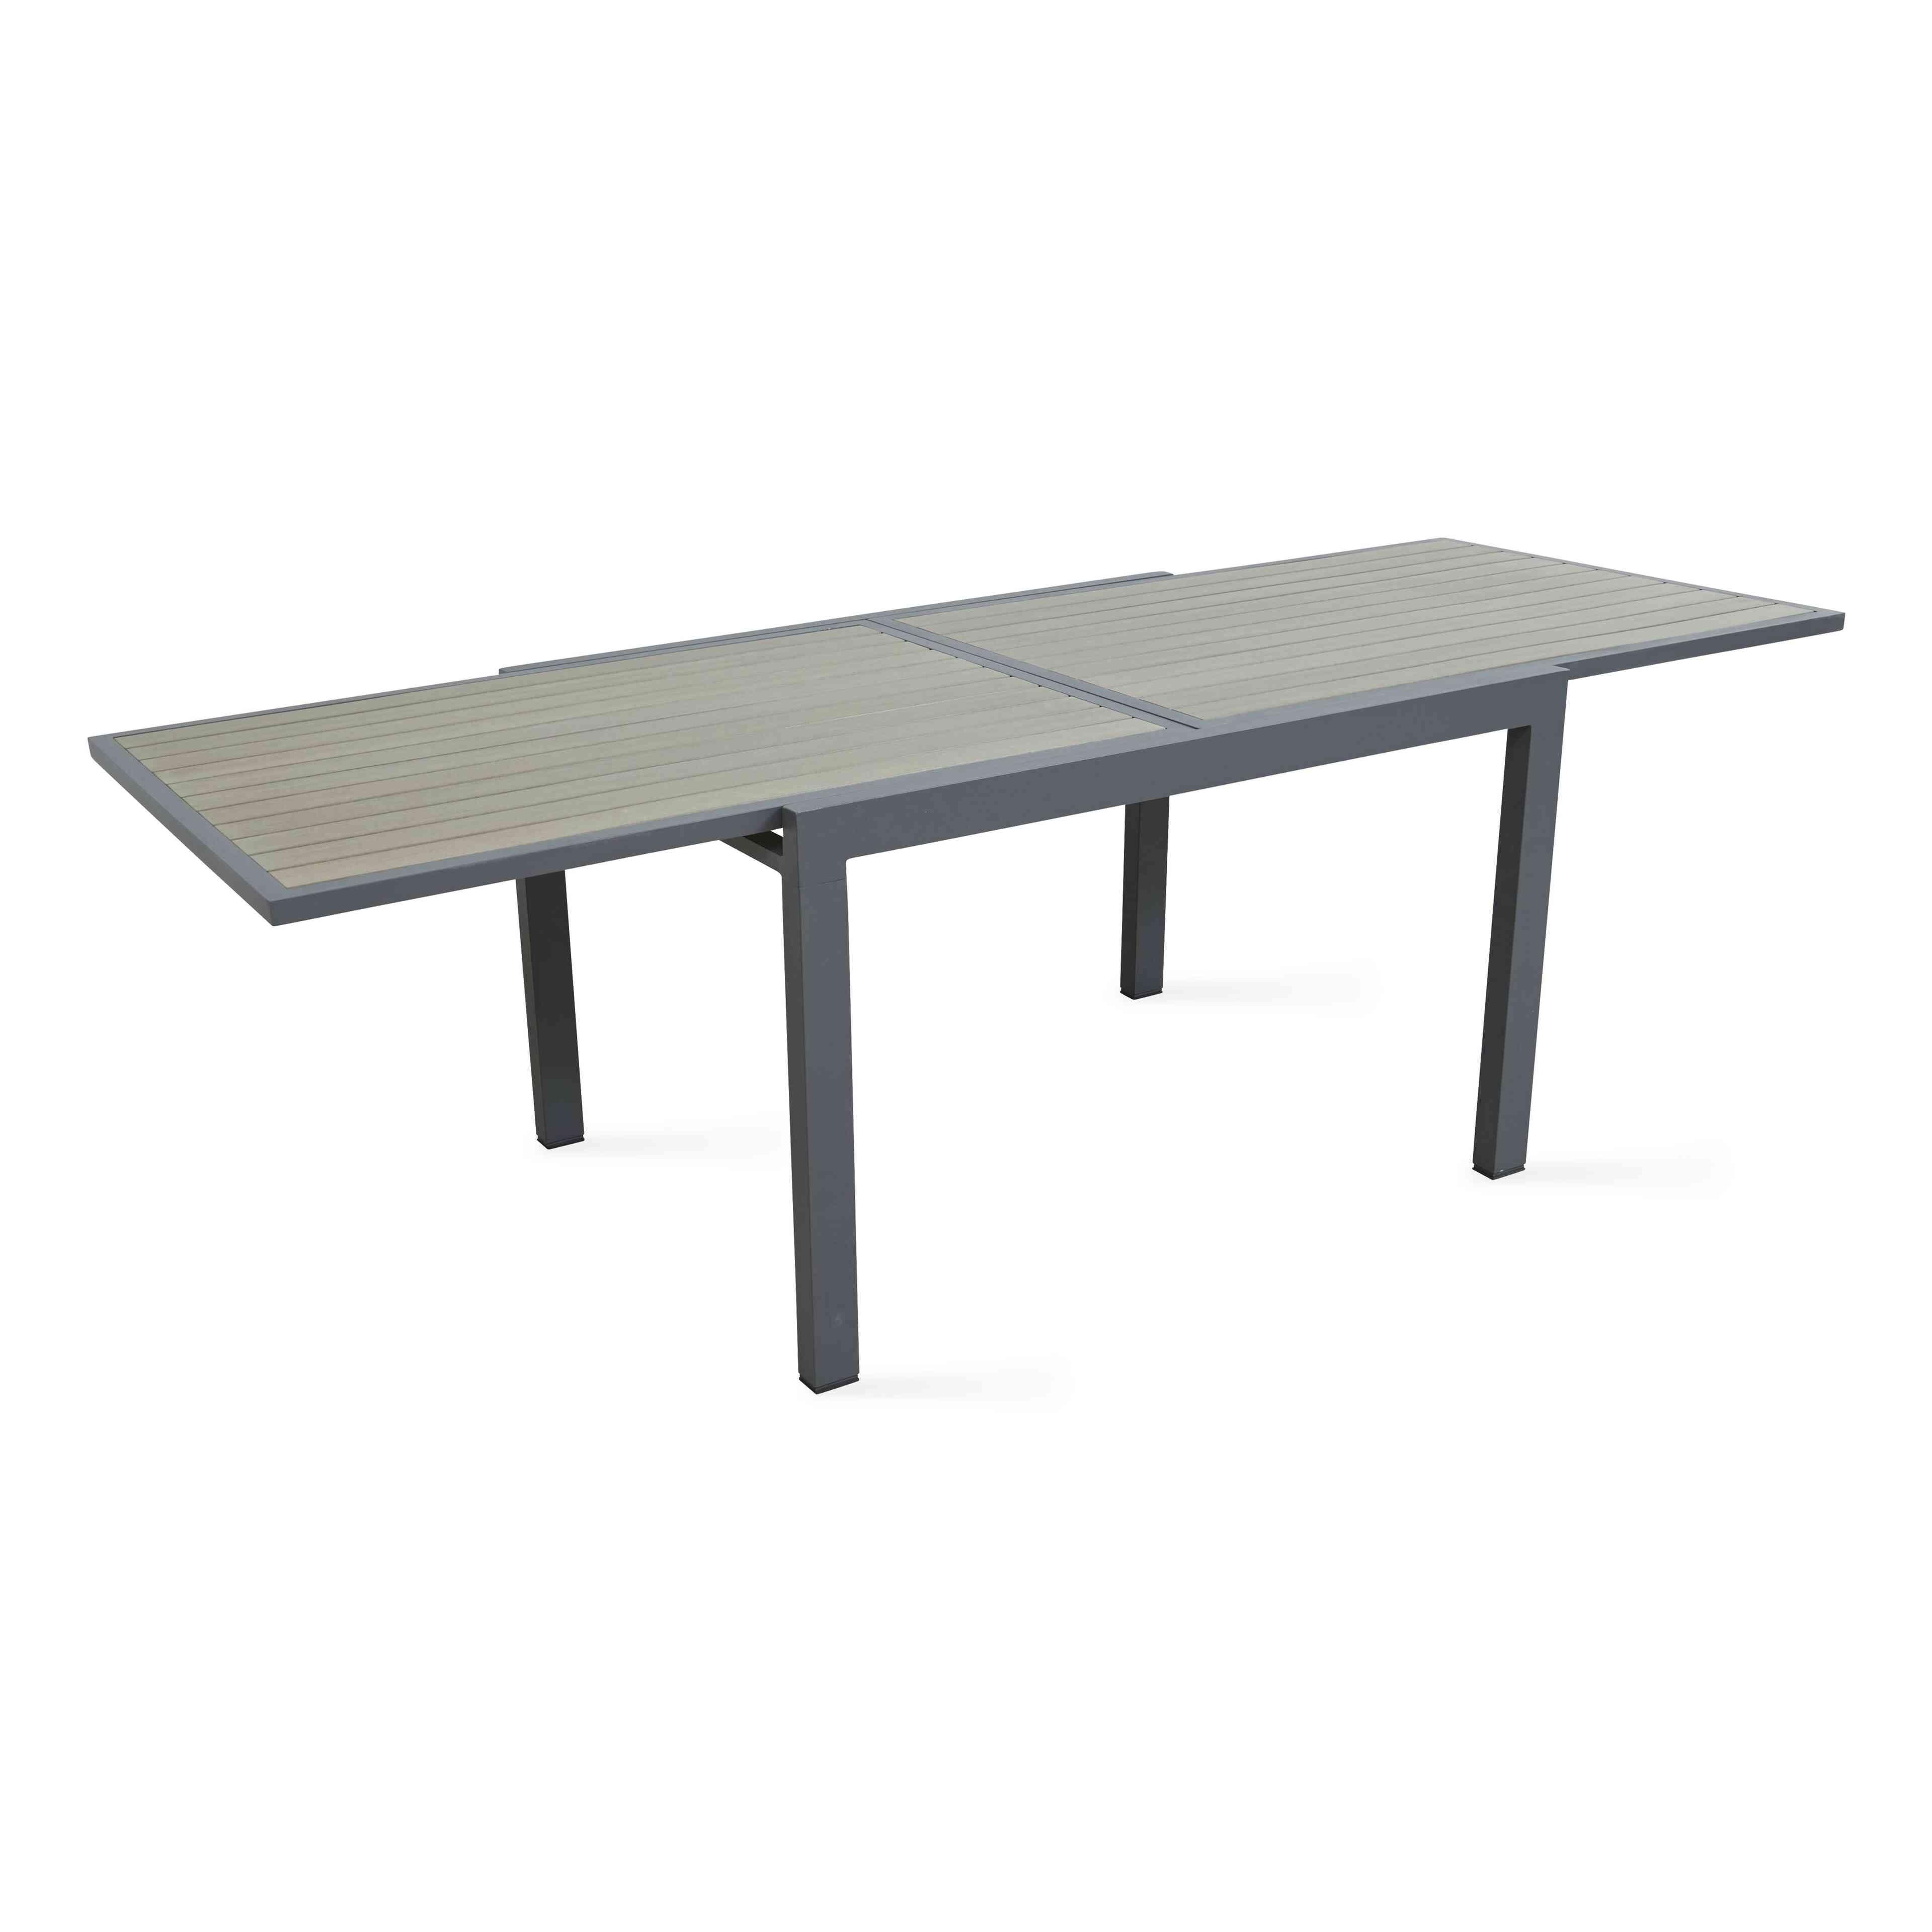 table de jardin rallonge alu et polywood. Black Bedroom Furniture Sets. Home Design Ideas